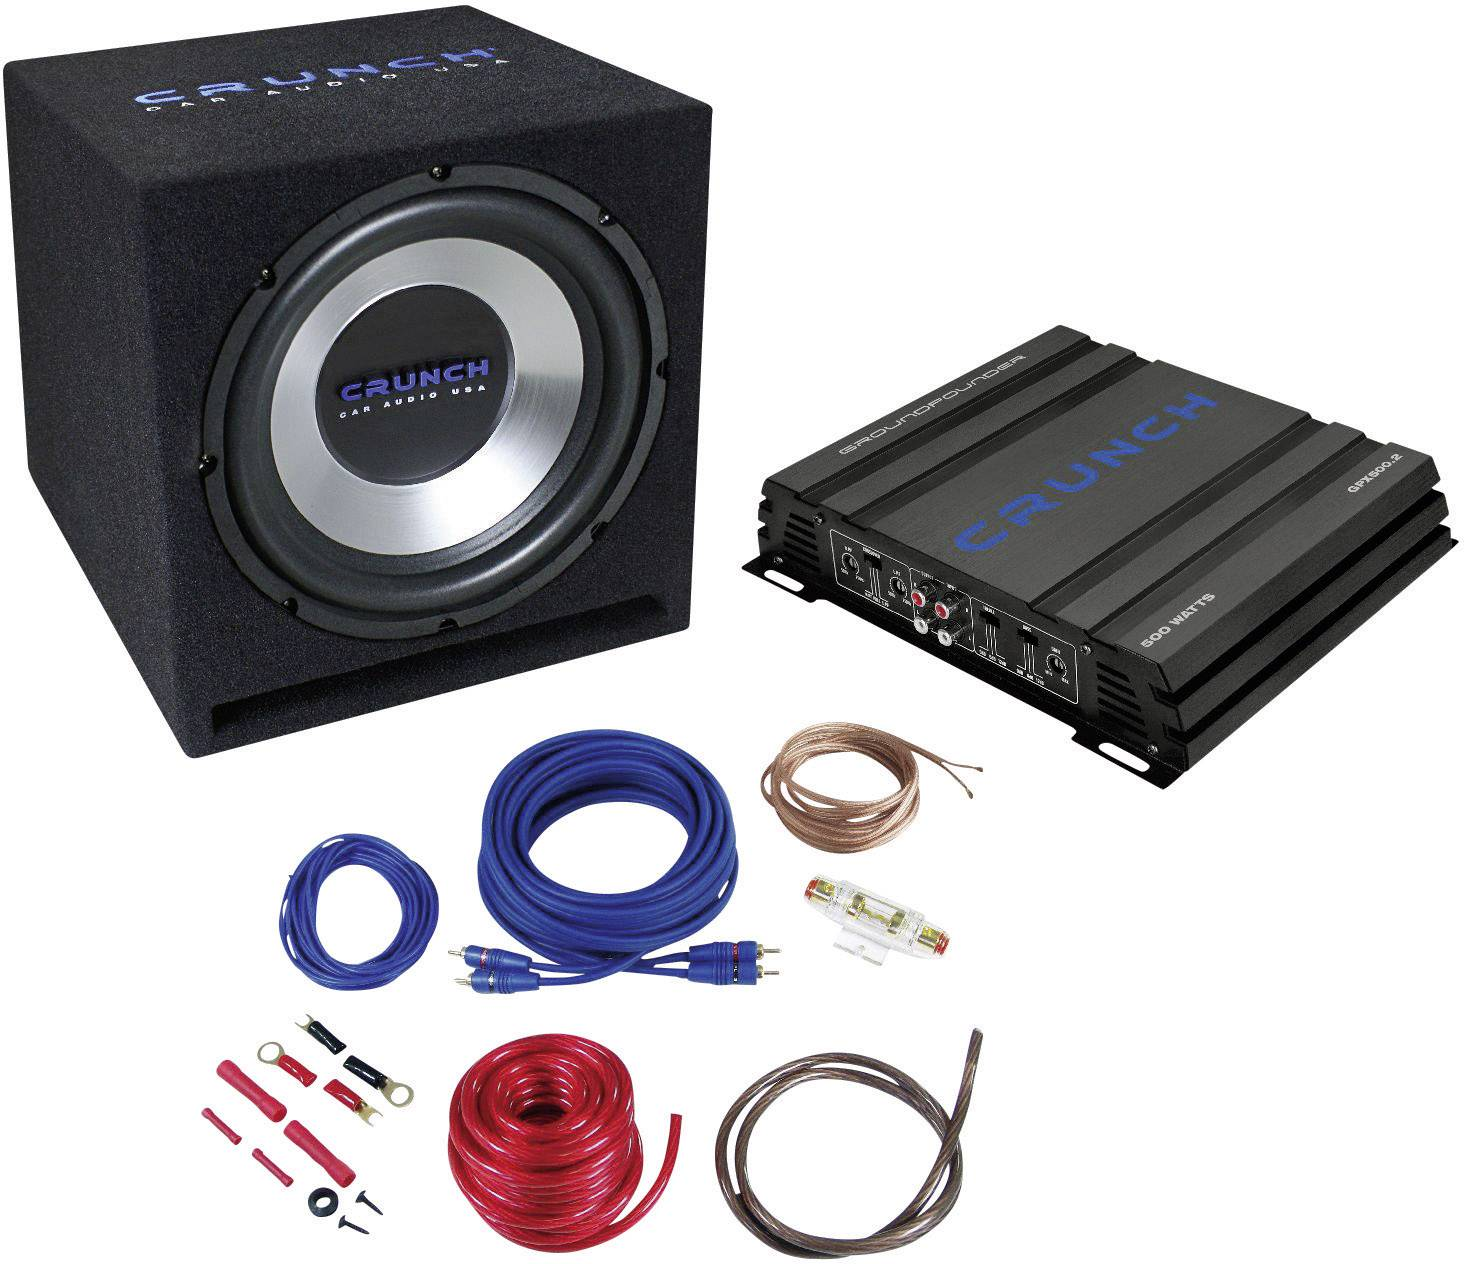 Hi-Fi súprava do auta Crunch CBP1000, 1000 W